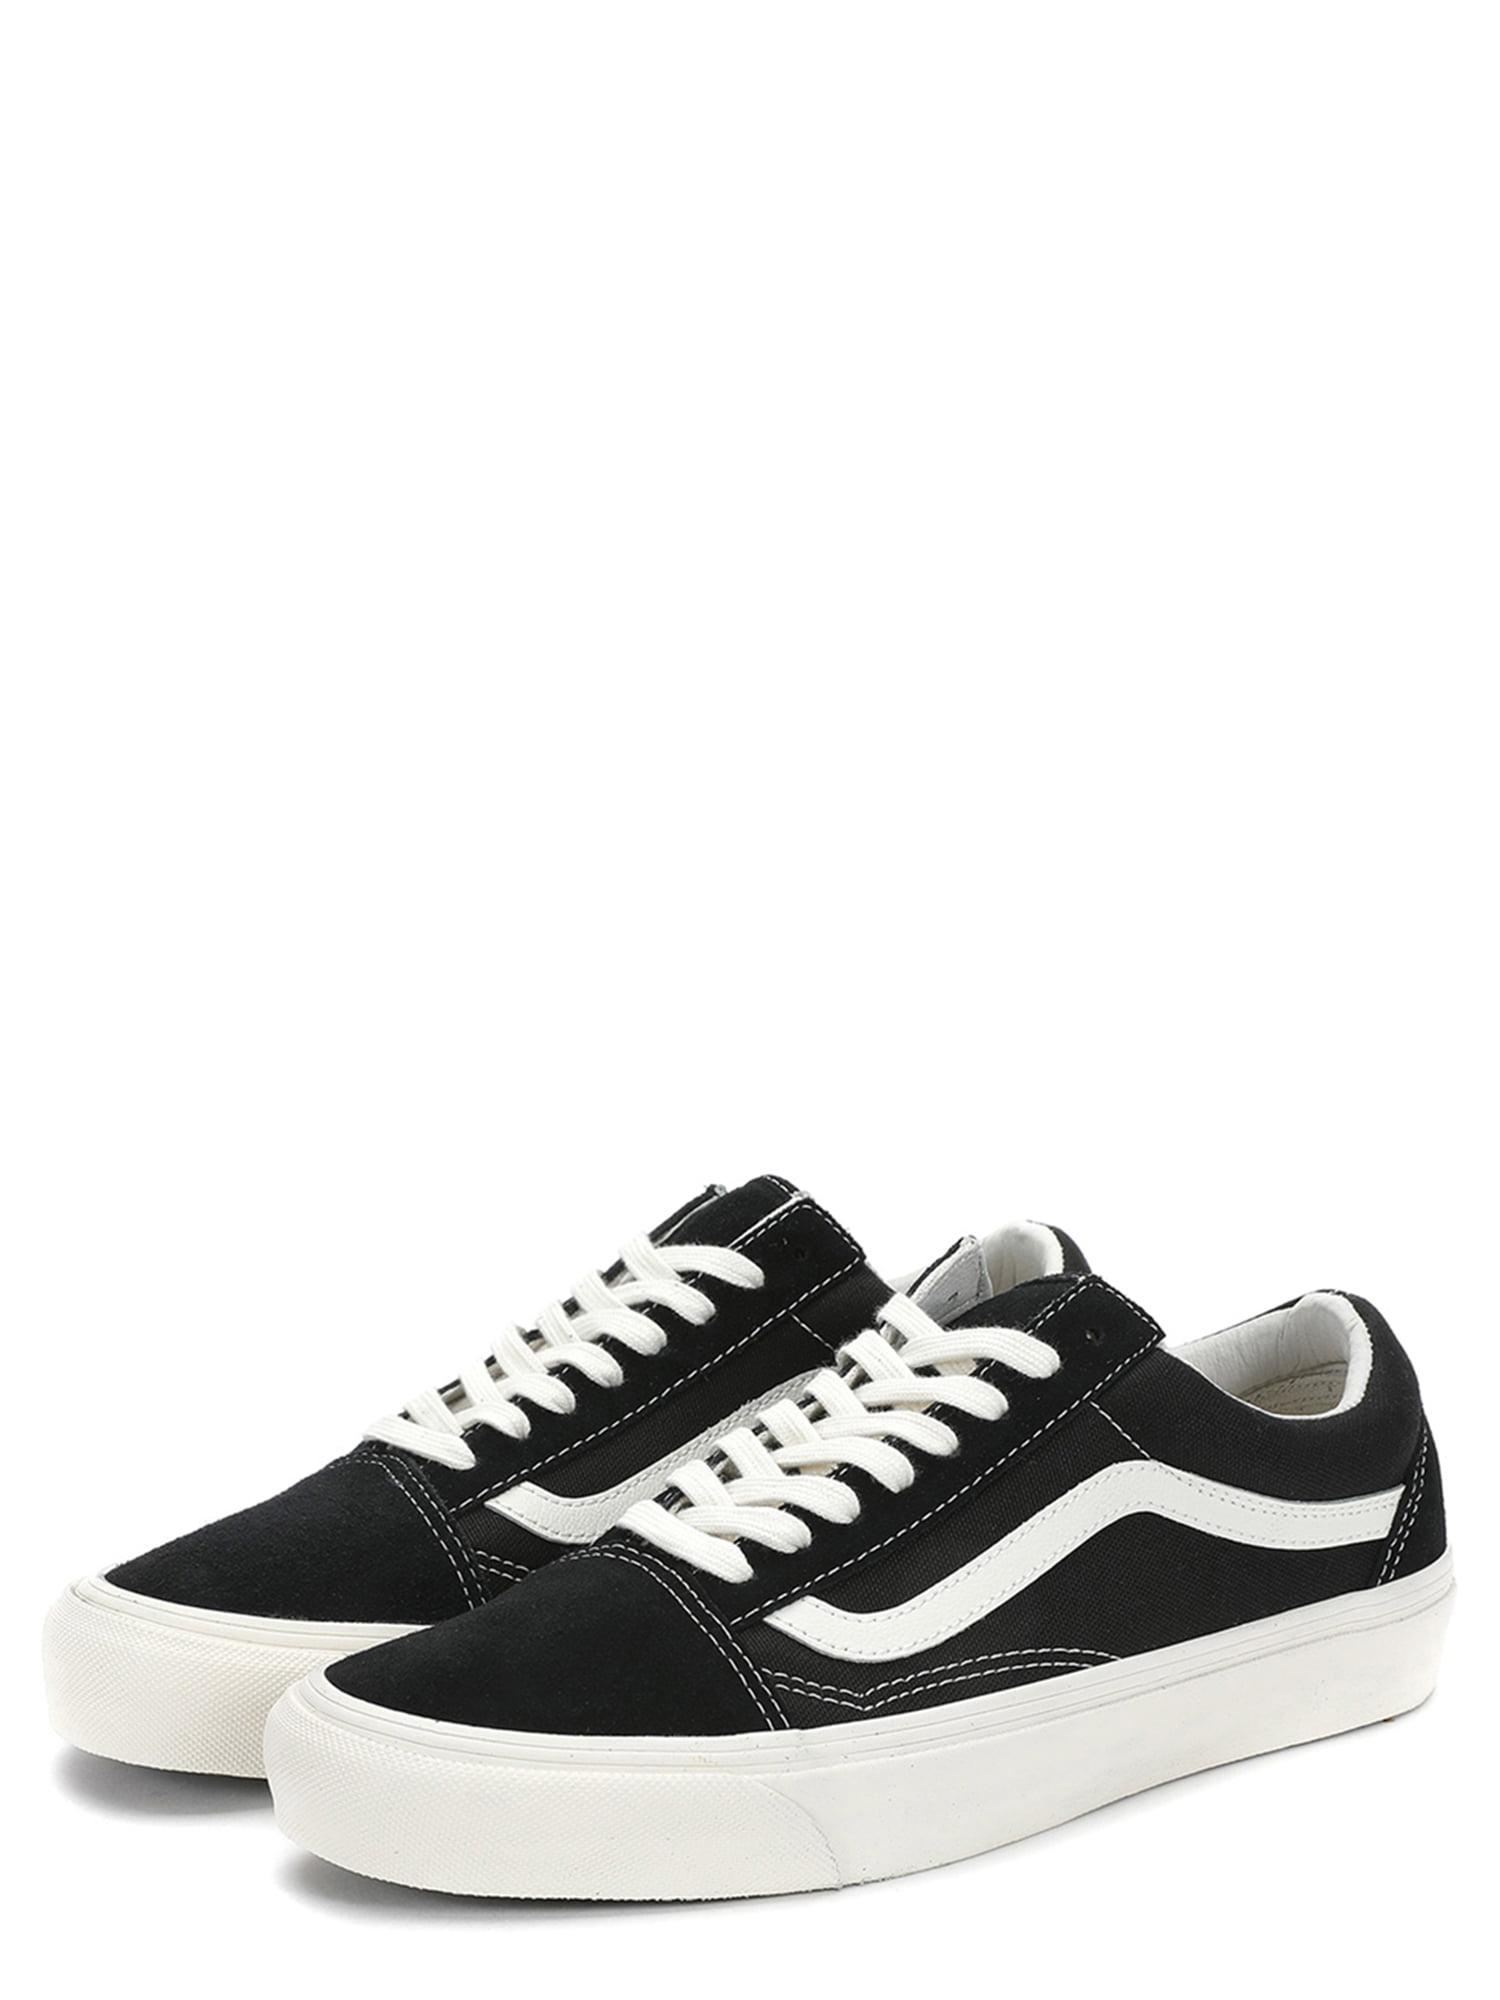 Vans OG Old Skool LX Sneakers VN0A36C8N8K BlackMarshmallow